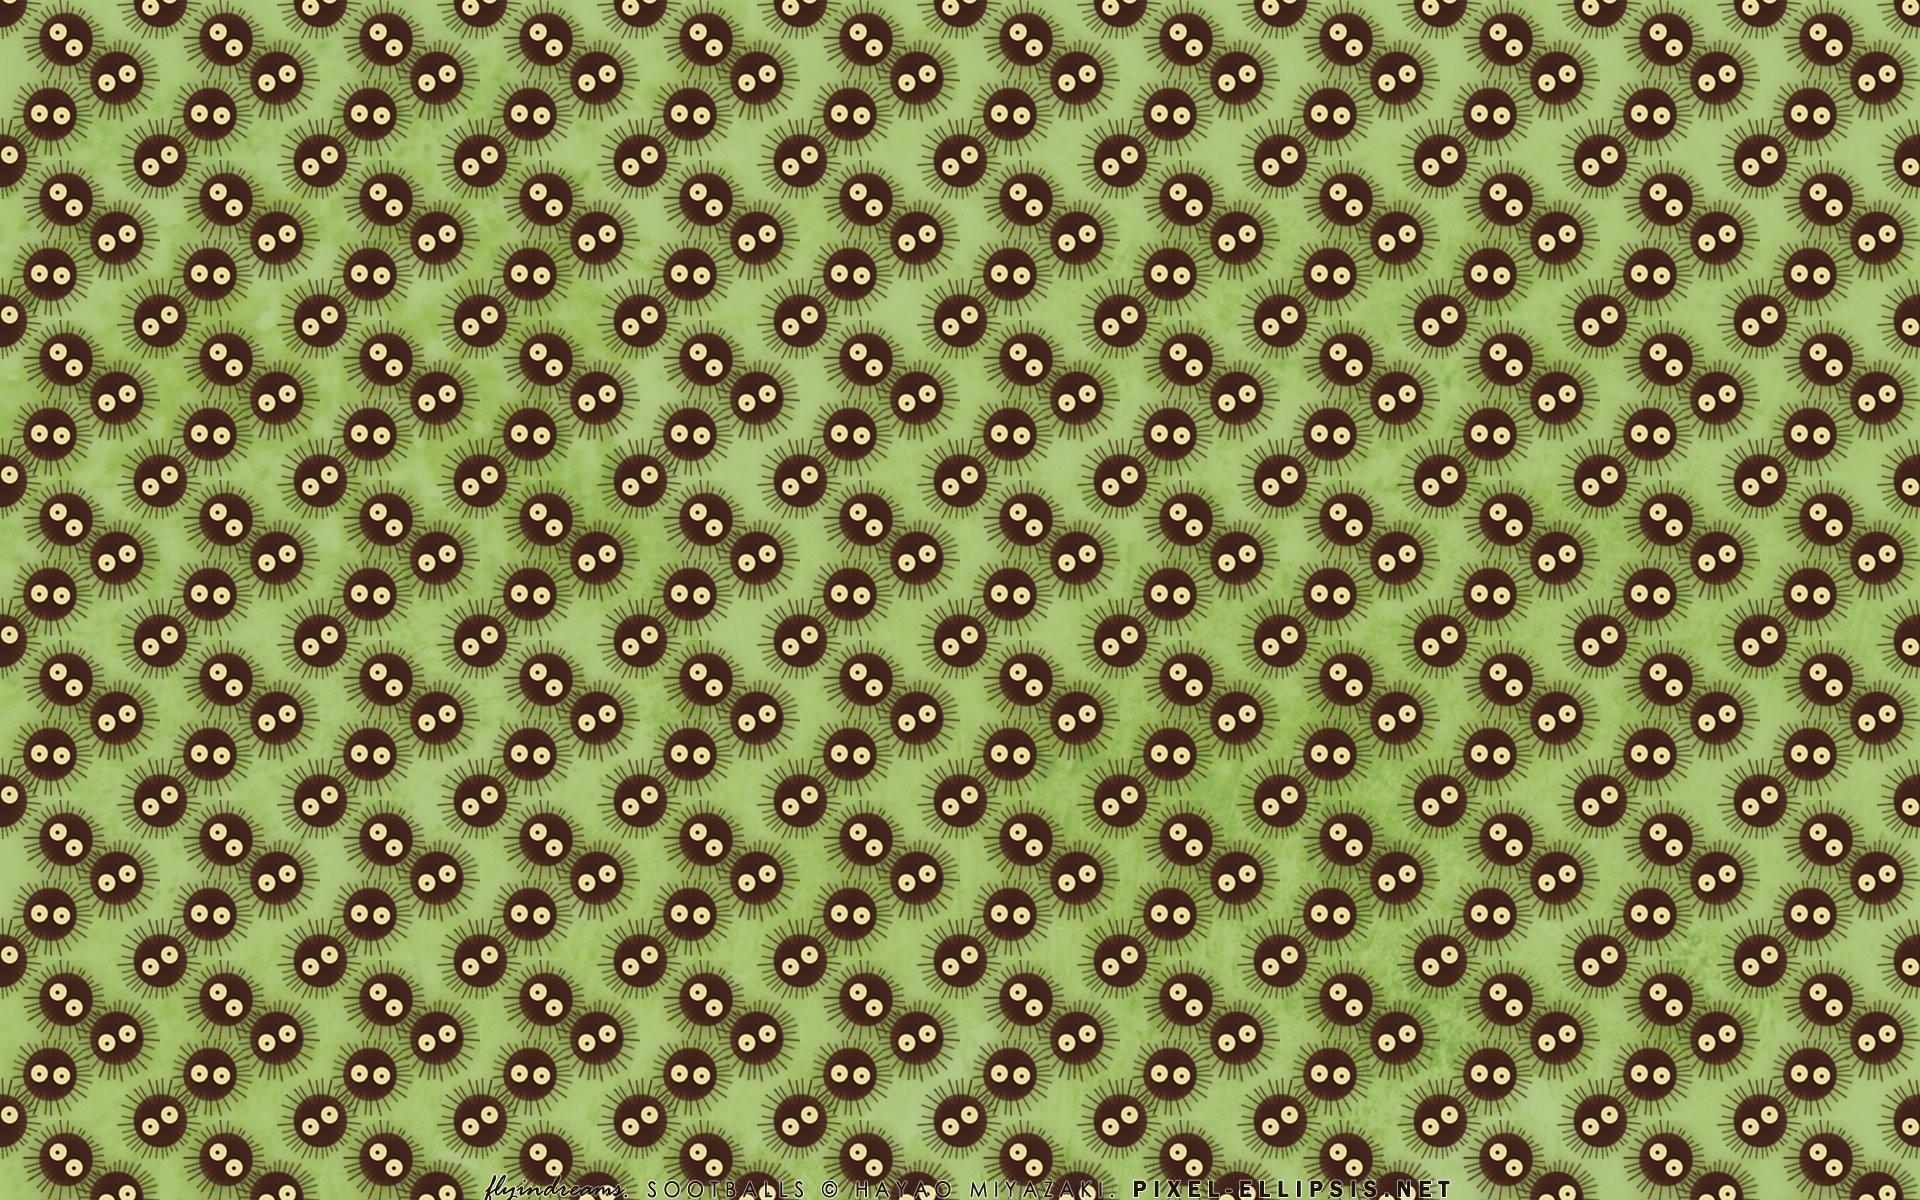 Sootballs Spirited Away Wallpaper